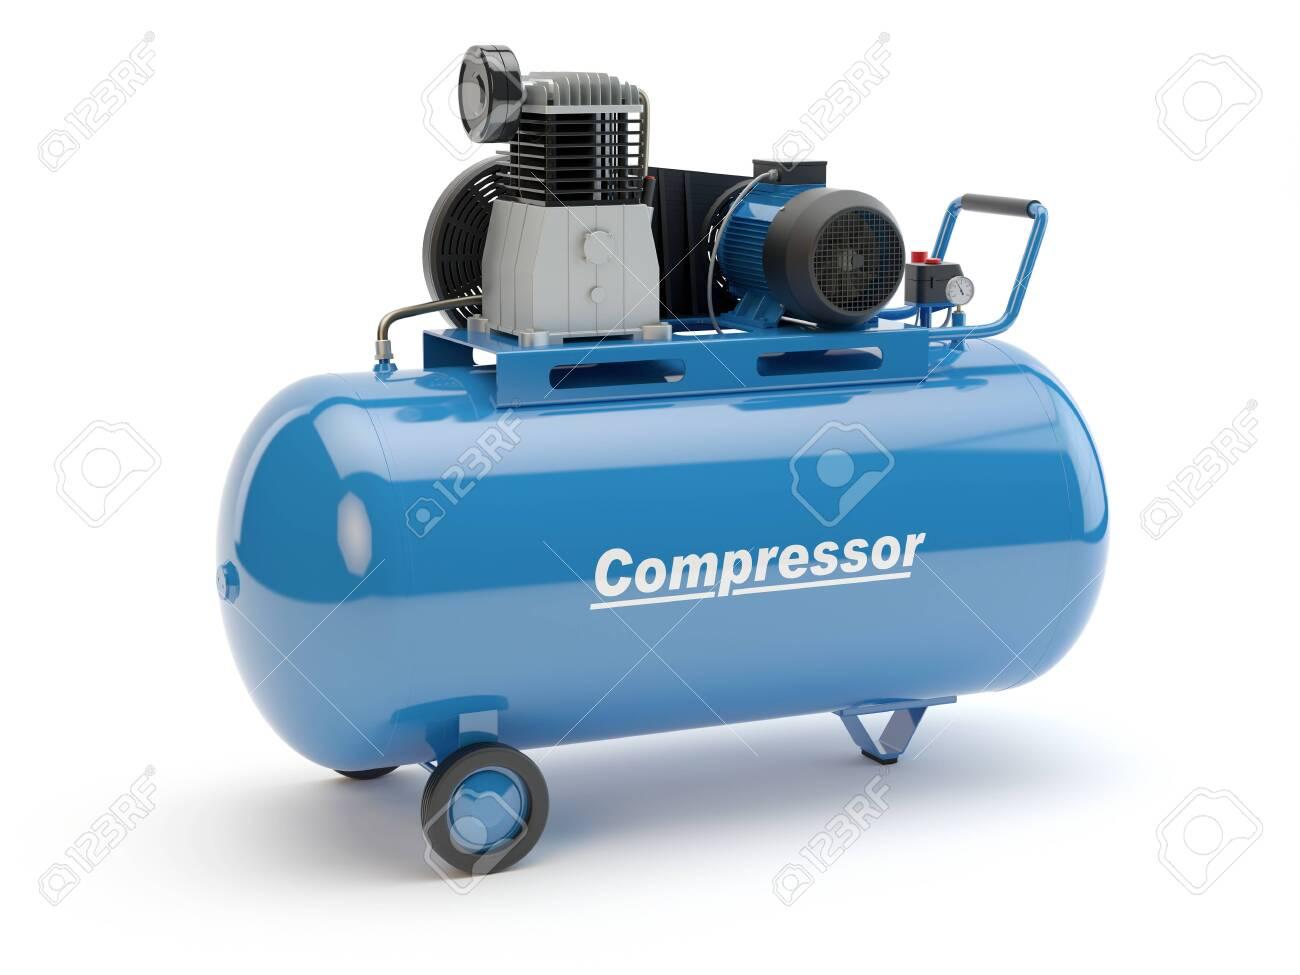 Blue Air Compressor, 3D illustration - 140877628